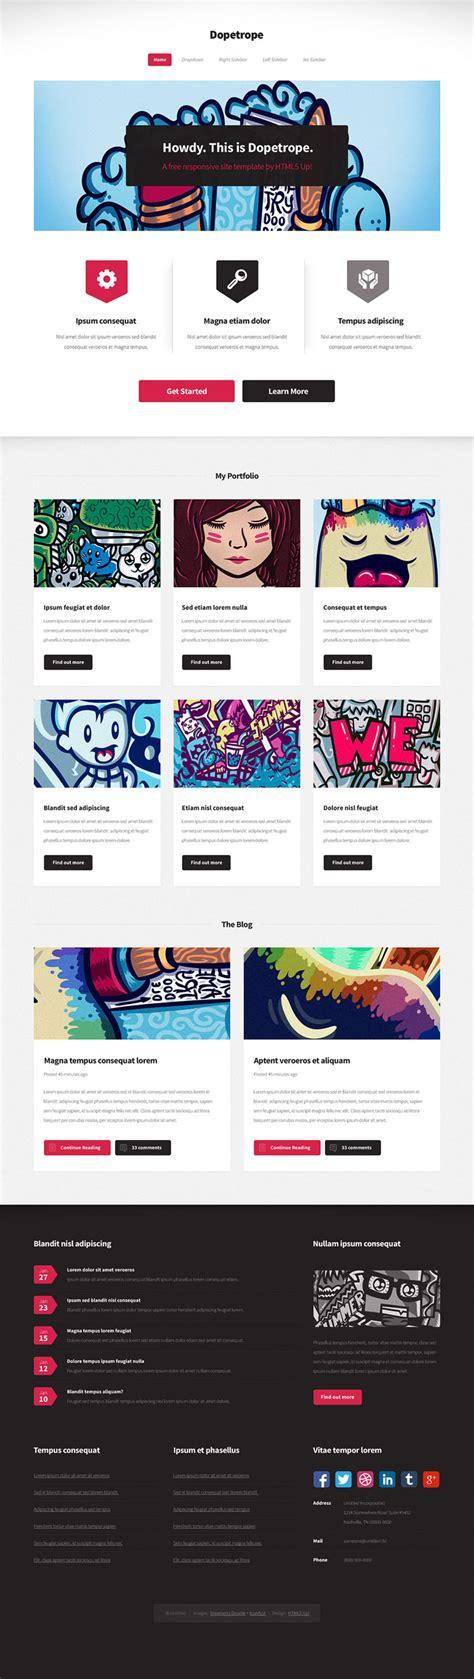 layout design inspiration blog modern website layout designs for inspiration 22 exles